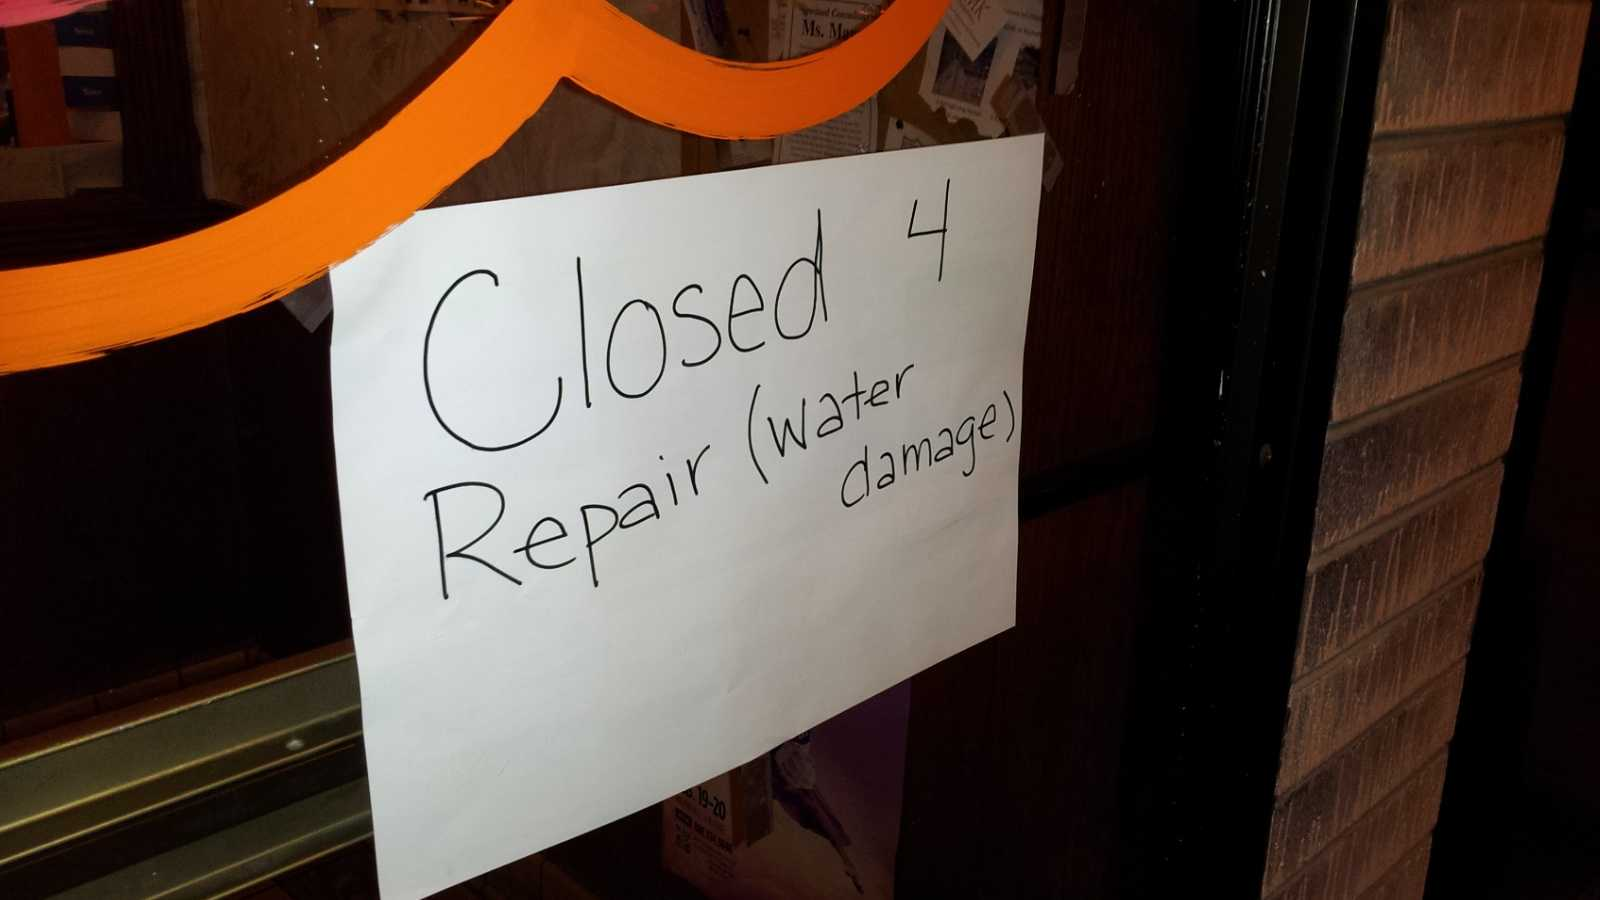 Water damage sign